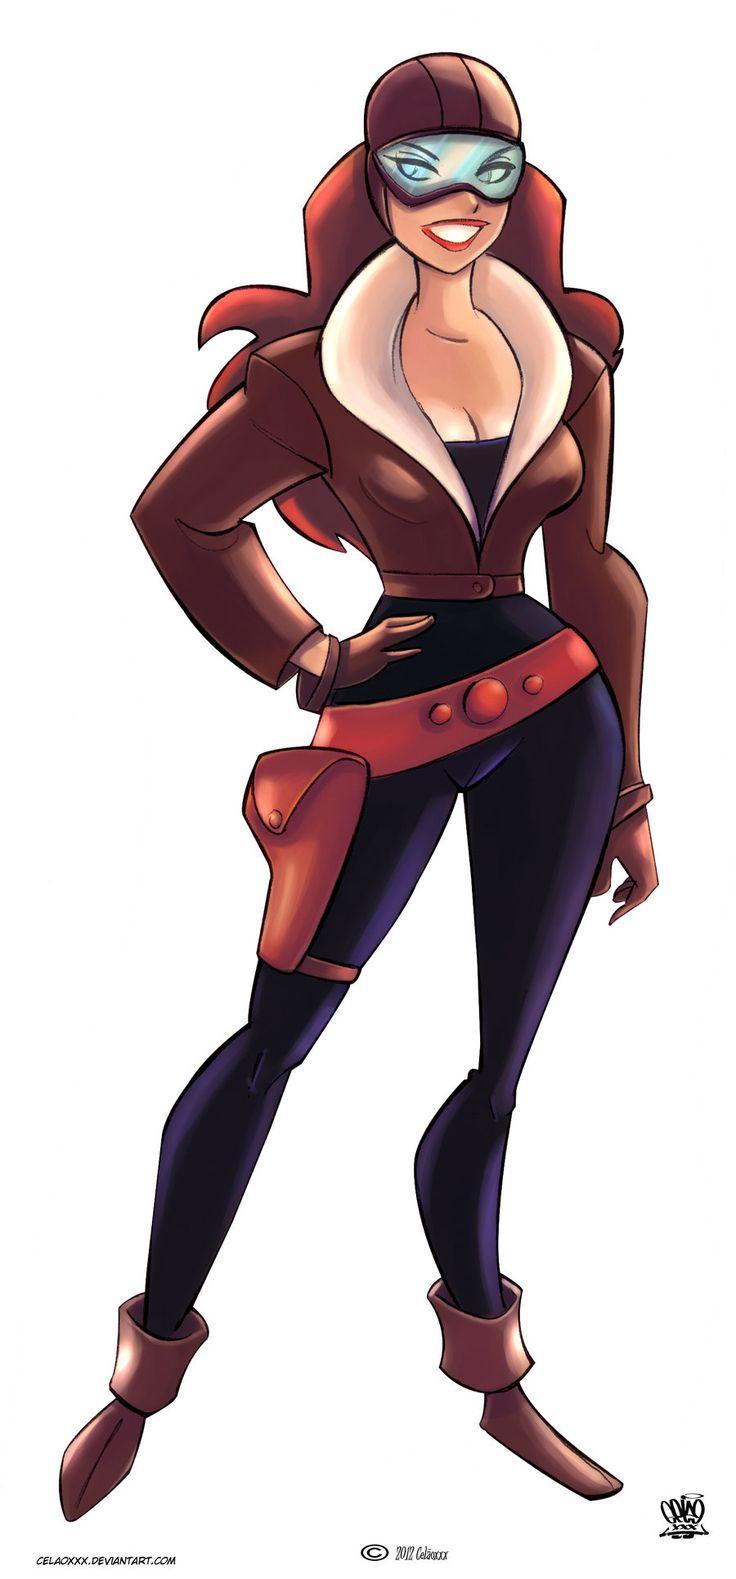 Bruce Timm - Batman the Animated Series